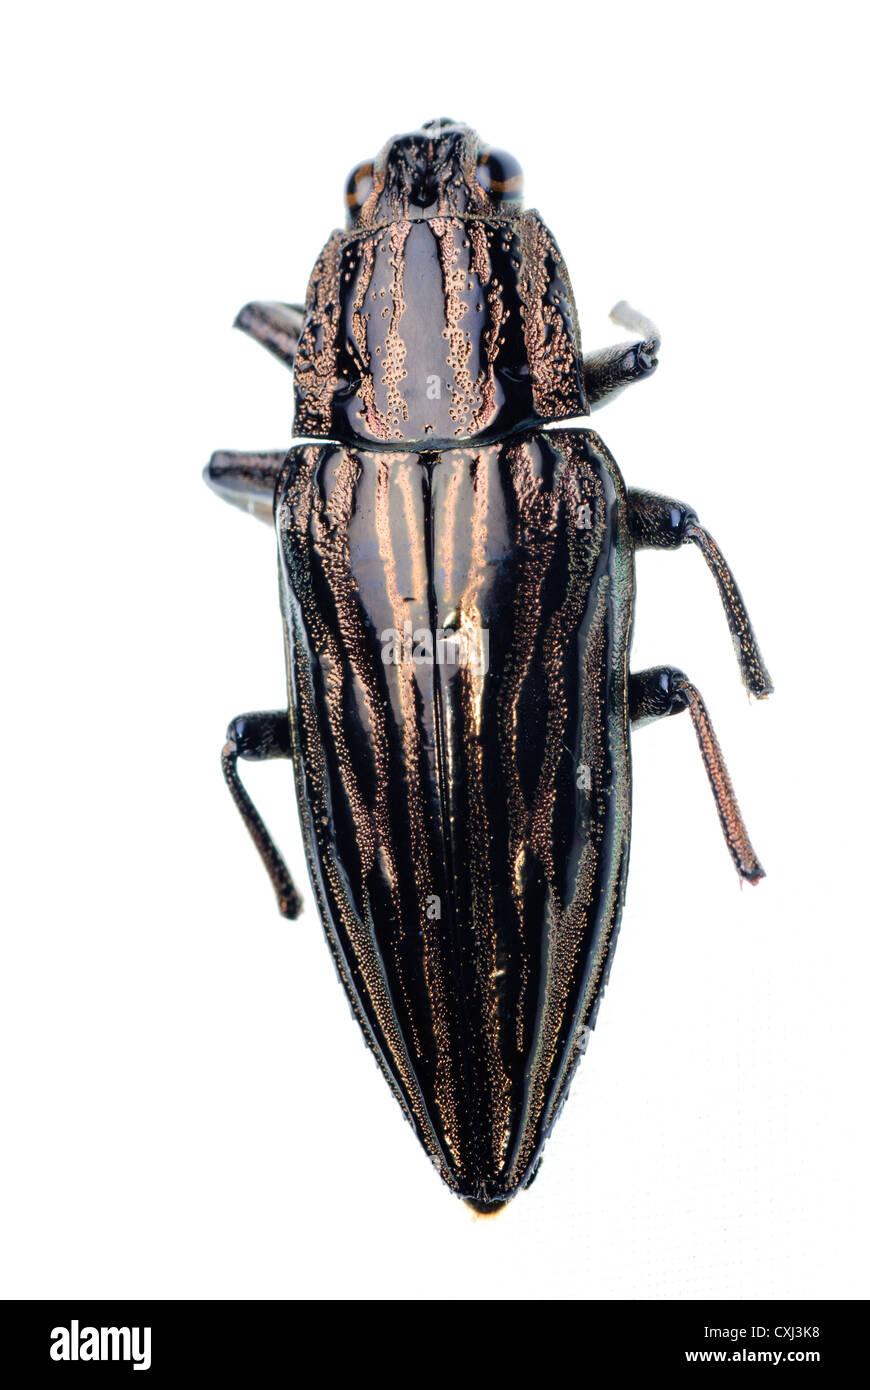 insect jewel beetle - Stock Image